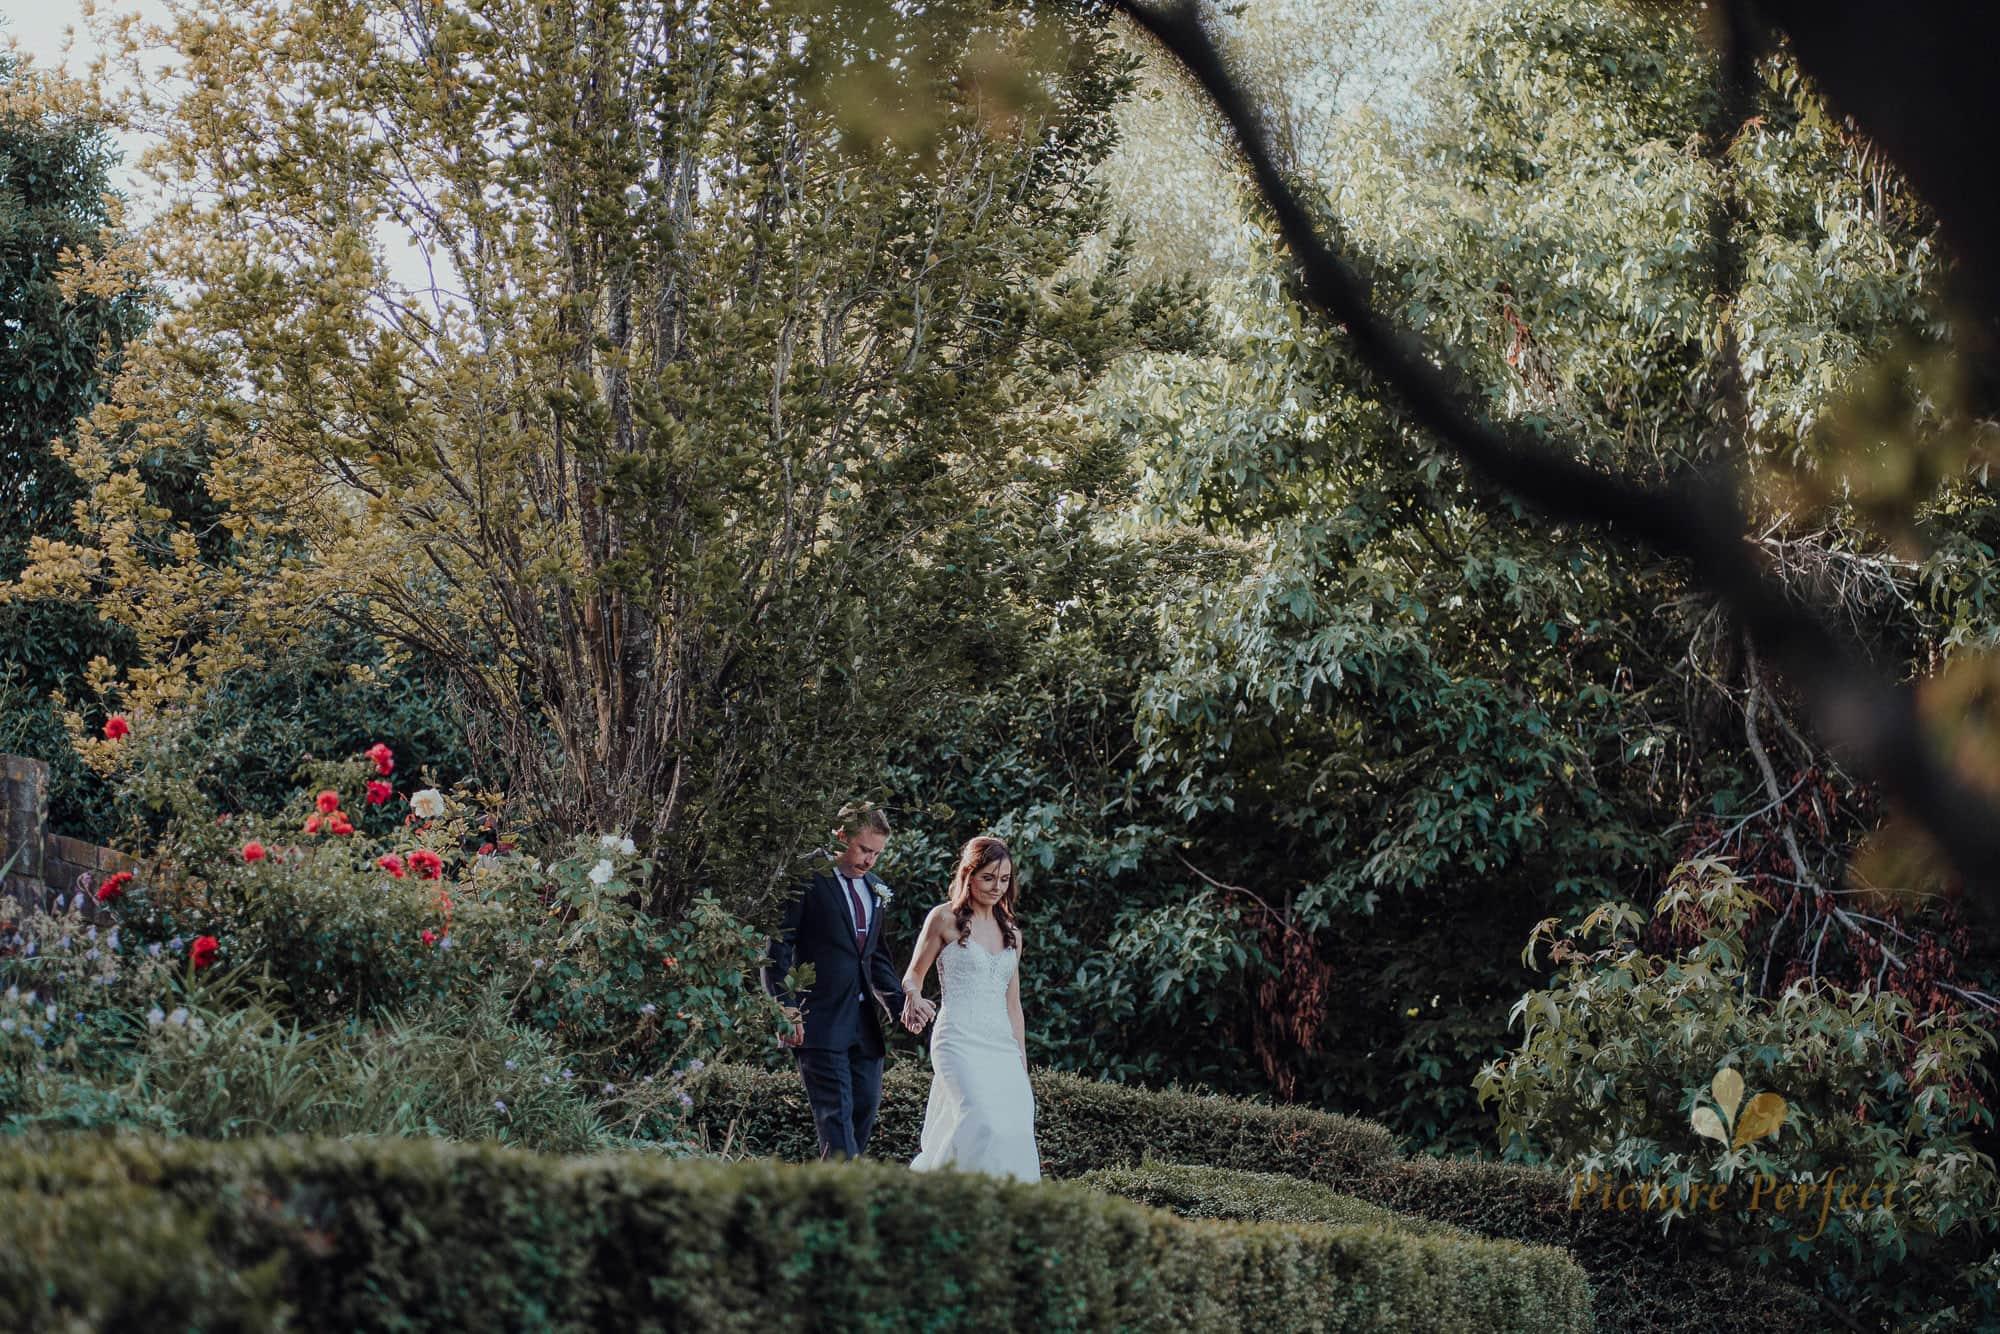 Roseburb Park wedding of Casey 4490